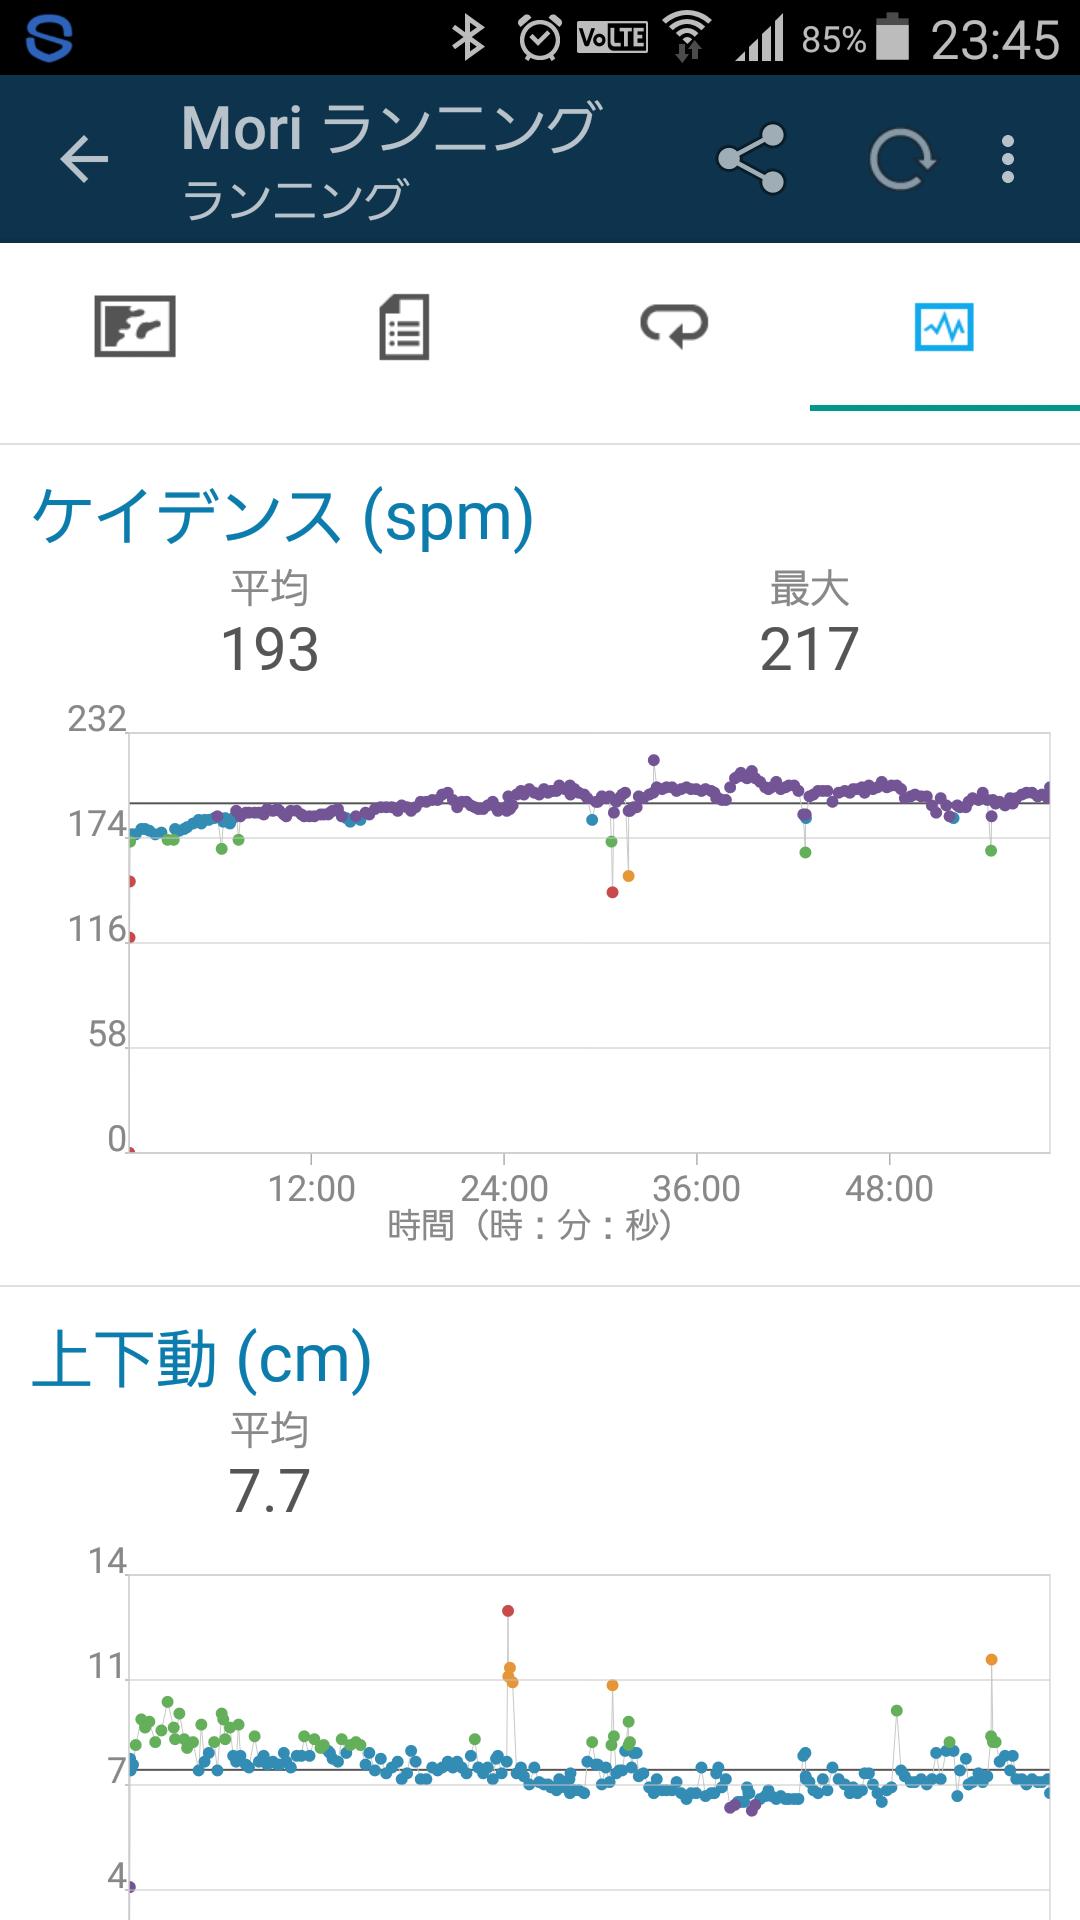 Screenshot_2015-09-25-23-45-16.png